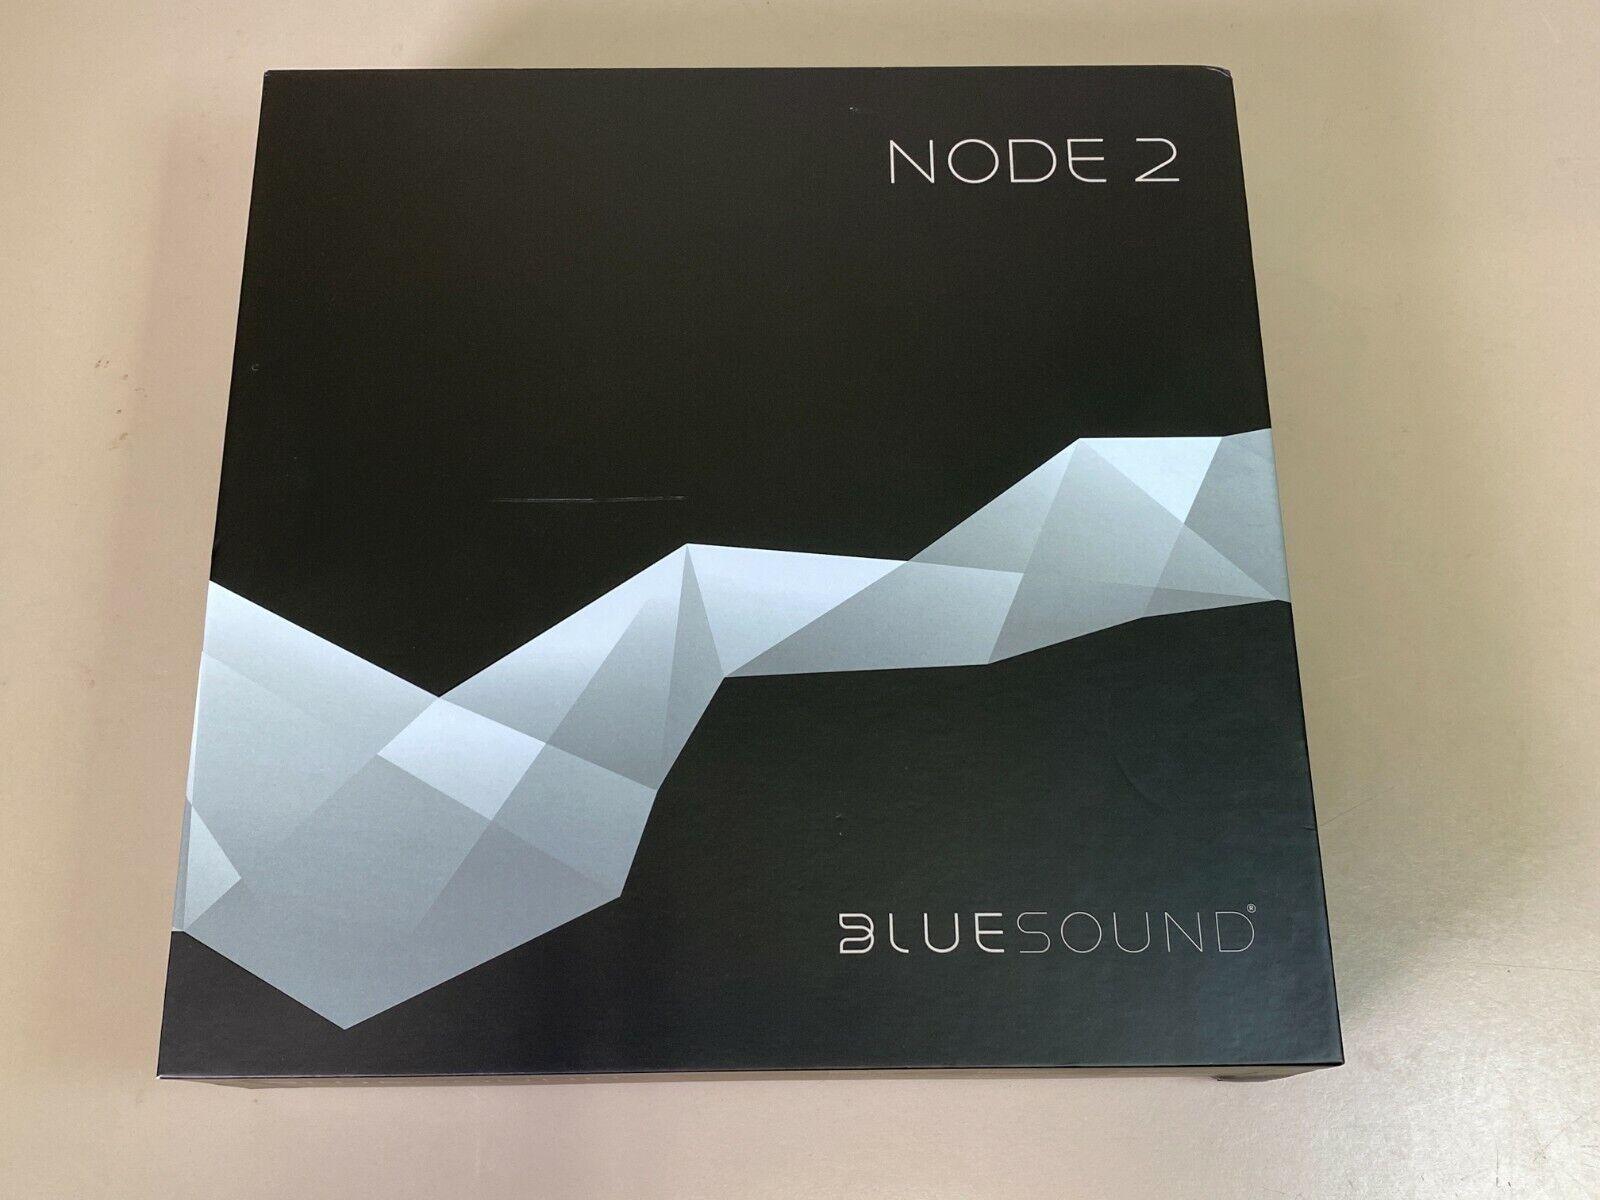 NEW BLUESOUND NODE 2 WIRELESS STREAMING MUSIC PLAYER bluesound music new node player streaming wireless